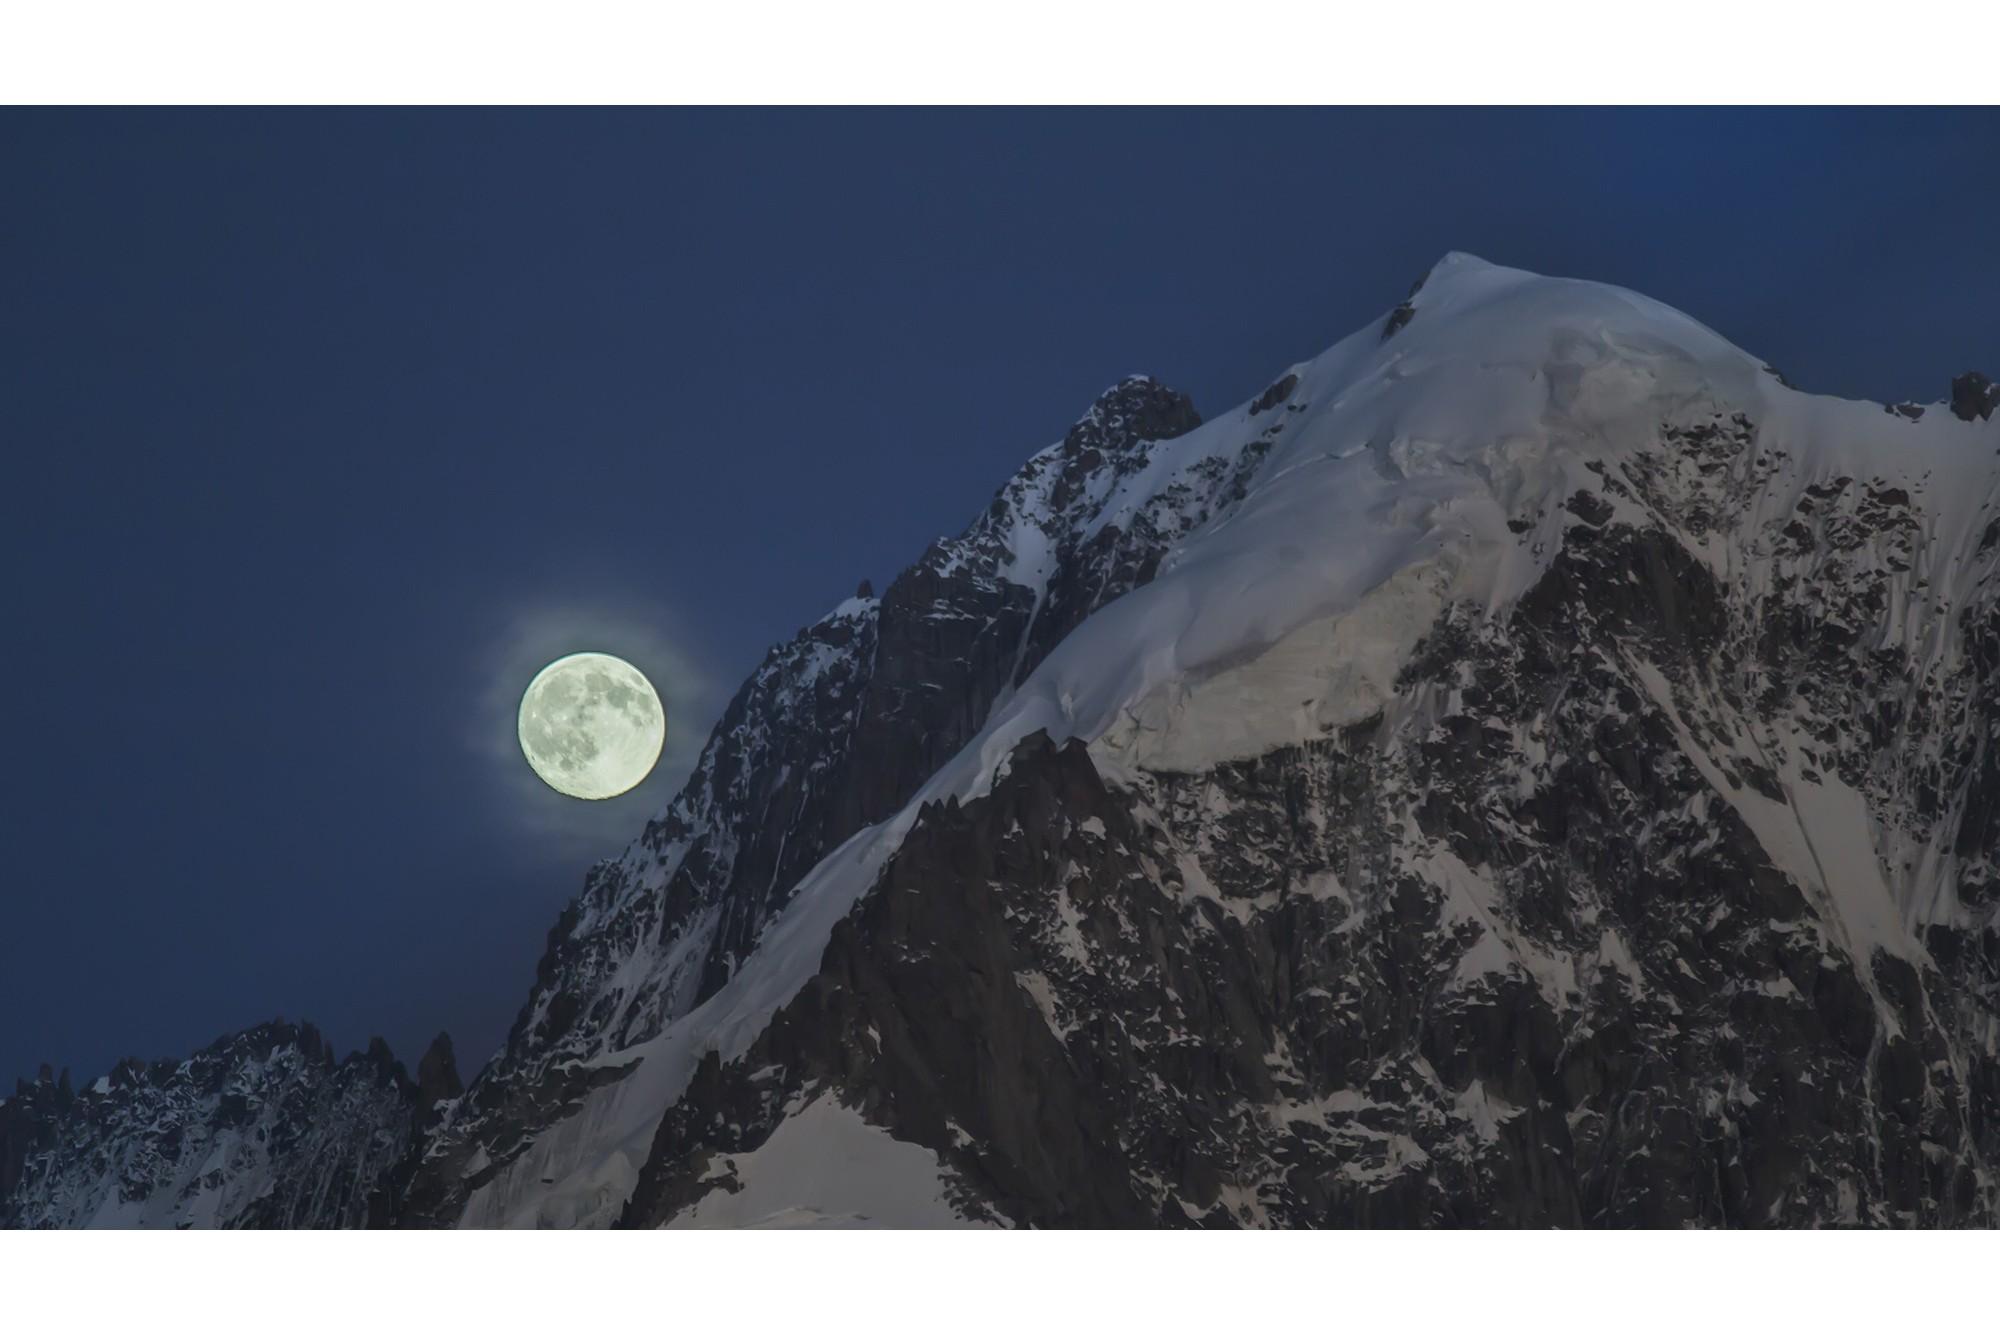 Time Lapse footage Full moon along edge Aiguille Verte - Mont Blanc